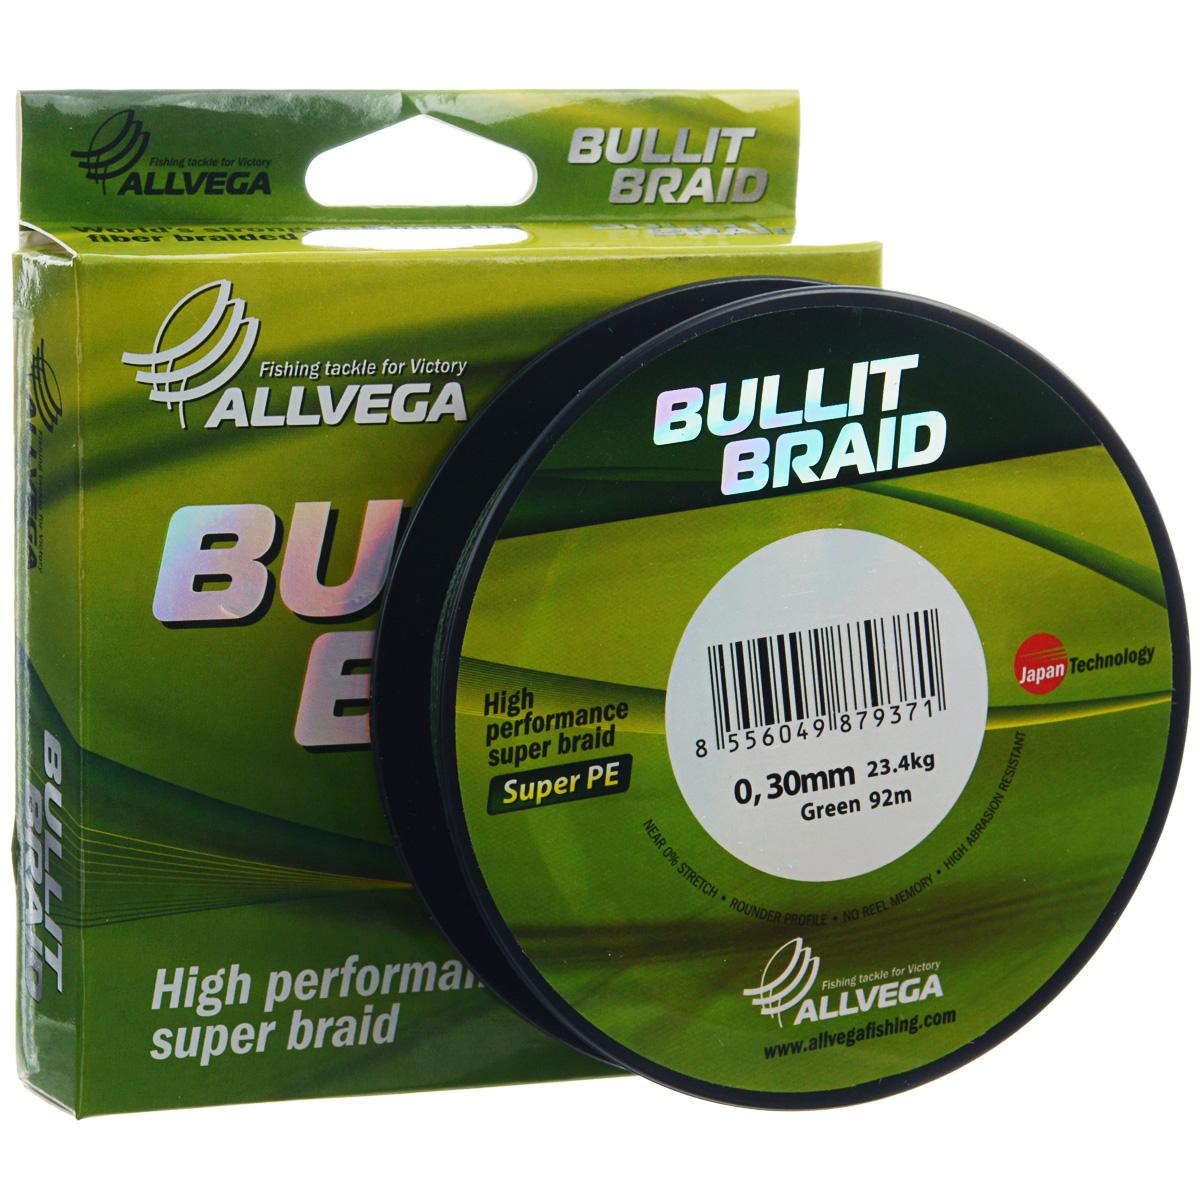 Леска плетеная Allvega  Bullit Braid , цвет: темно-зеленый, 92 м, 0,3 мм, 23,4 кг - Рыбалка